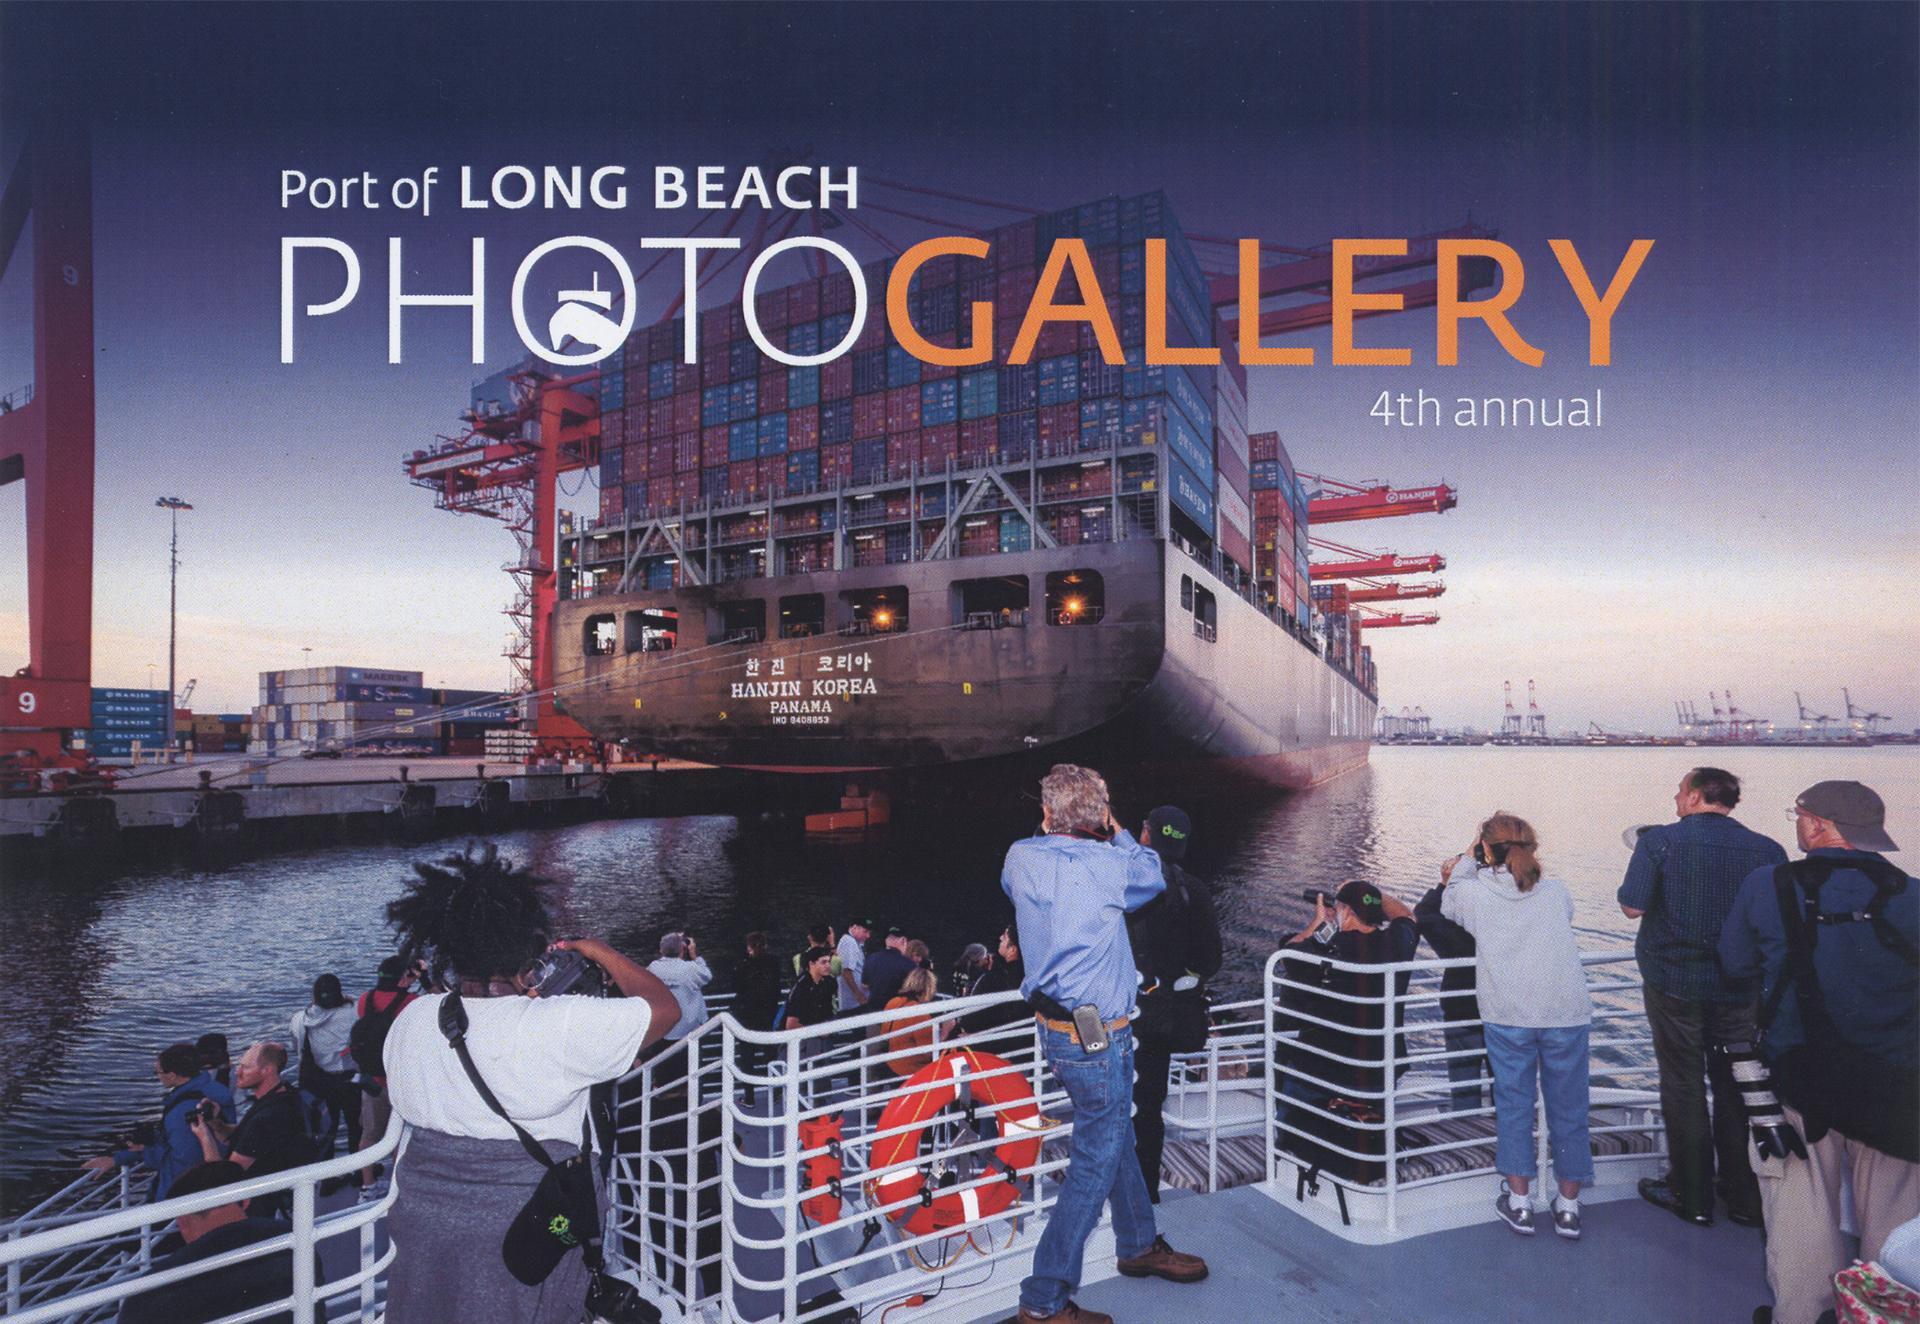 Port-of-Long-Beach-Photo-Gallery.jpg